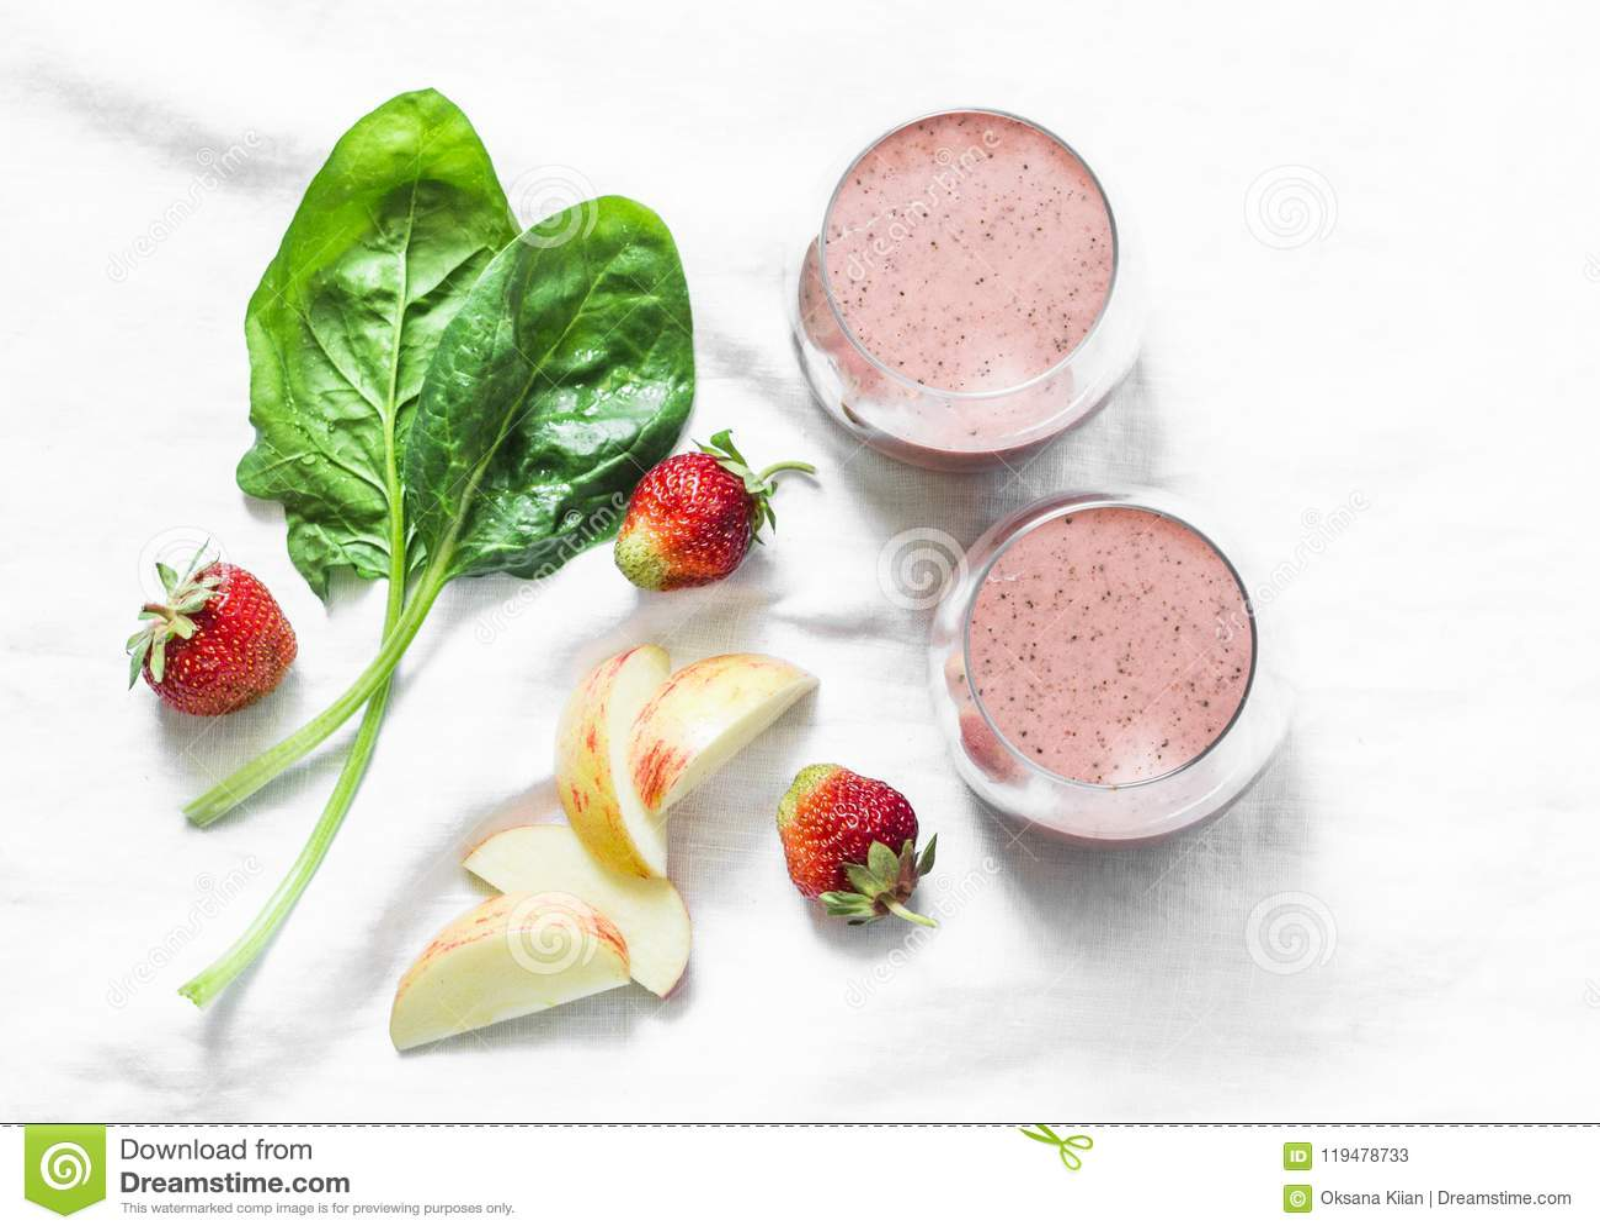 Probiotic γιαούρτι καρύδων, σπανάκι, μήλο, καταφερτζής φραουλών detox σε ένα ελαφρύ υπόβαθρο, τοπ άποψη Υγιής έννοια τροφίμων δια